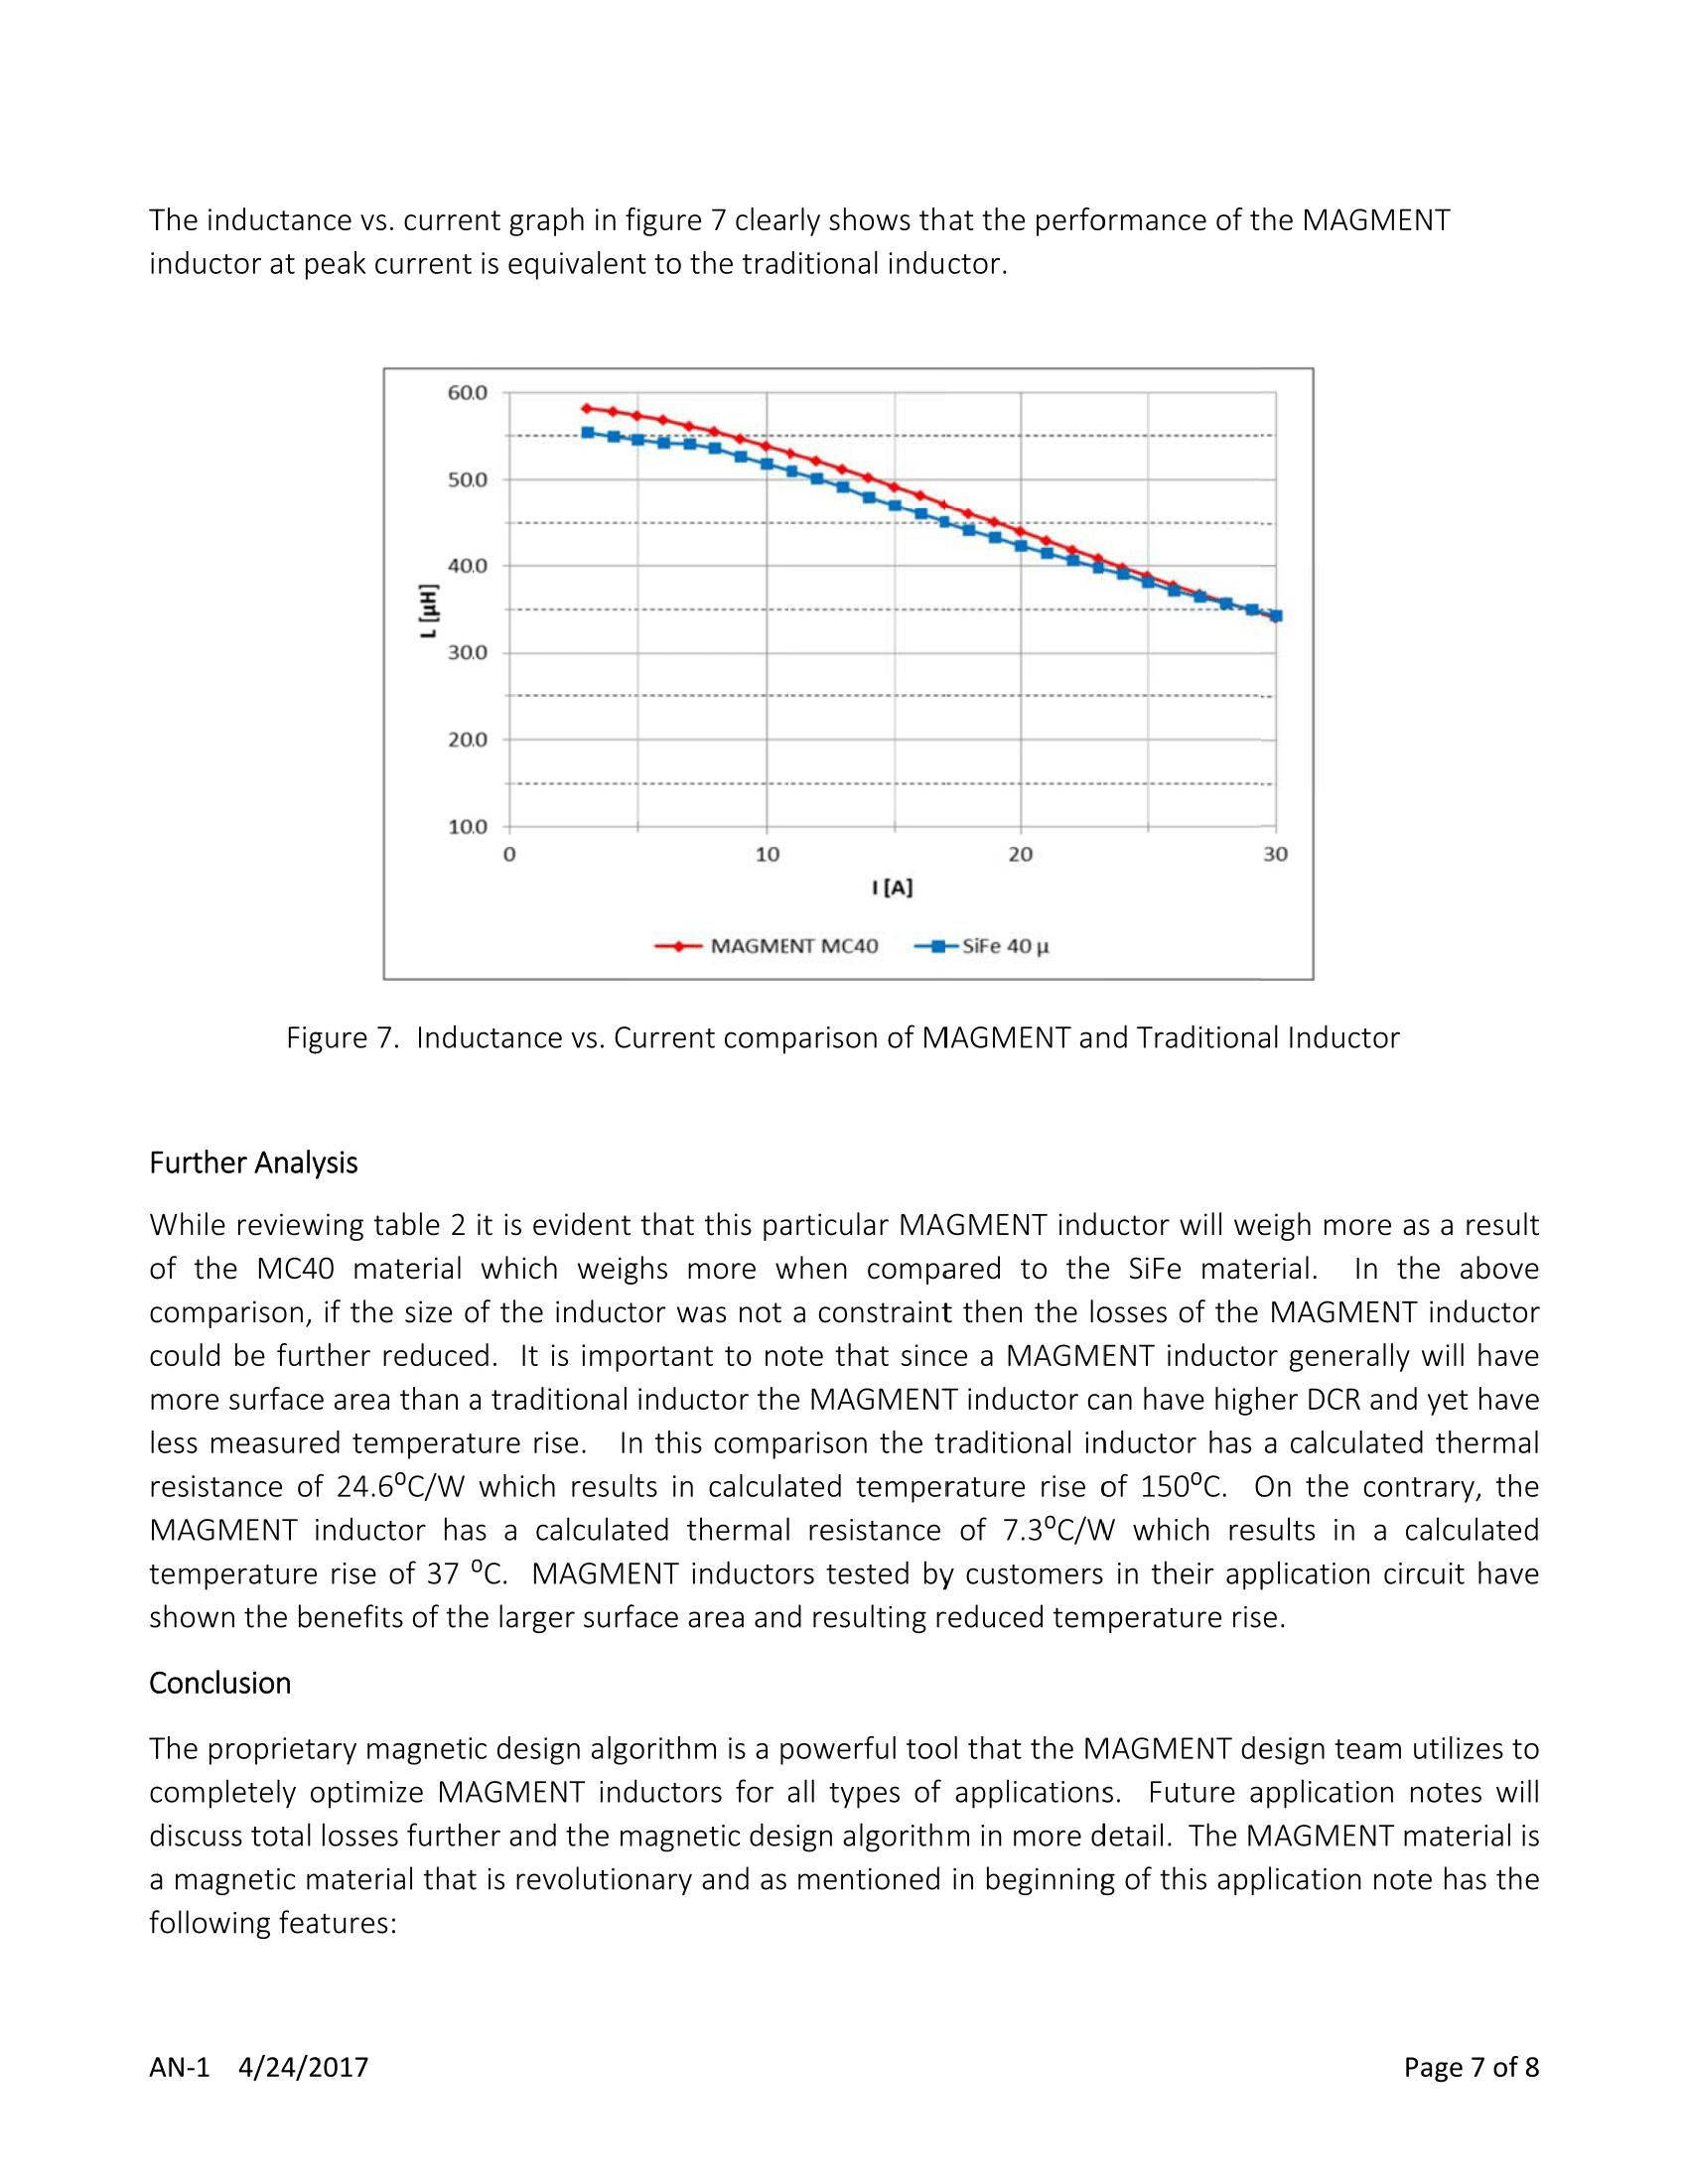 Breakthrough_in_Power_Magnetics_Materials-7.png